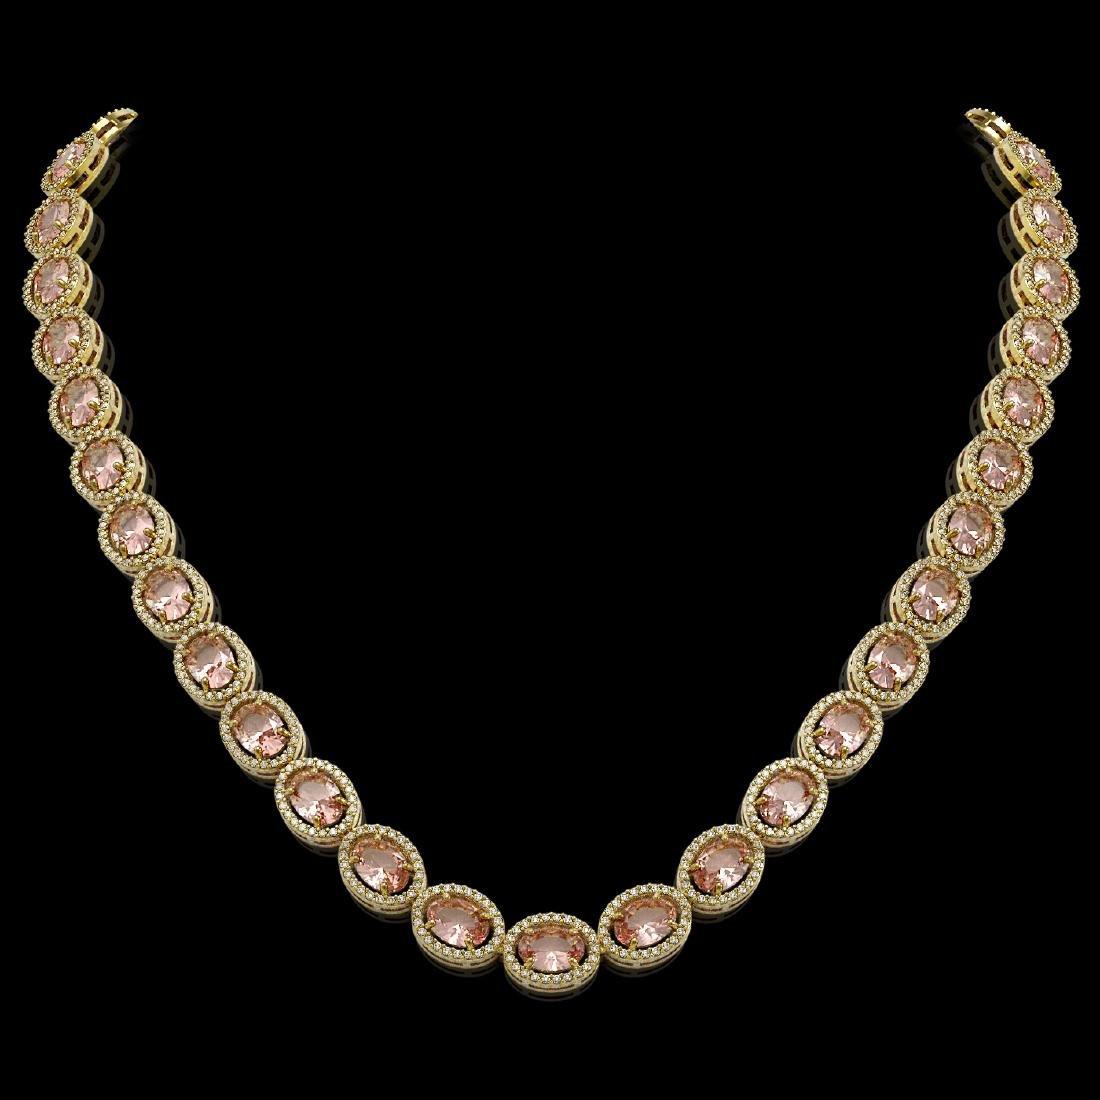 45.98 CTW Morganite & Diamond Halo Necklace 10K Yellow